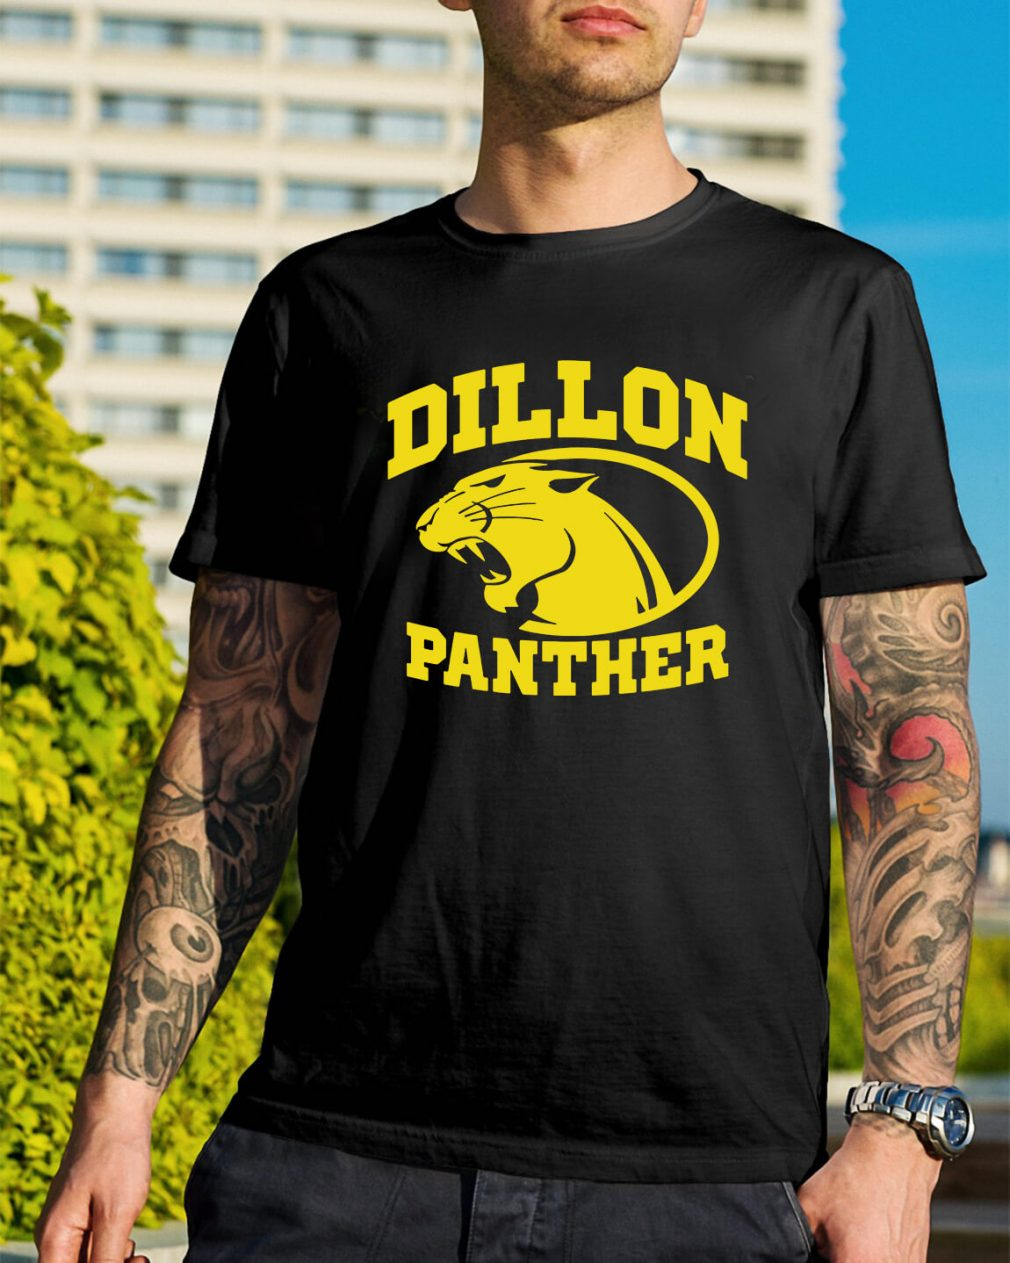 Friday Night Lights Dillon Panthers shirt